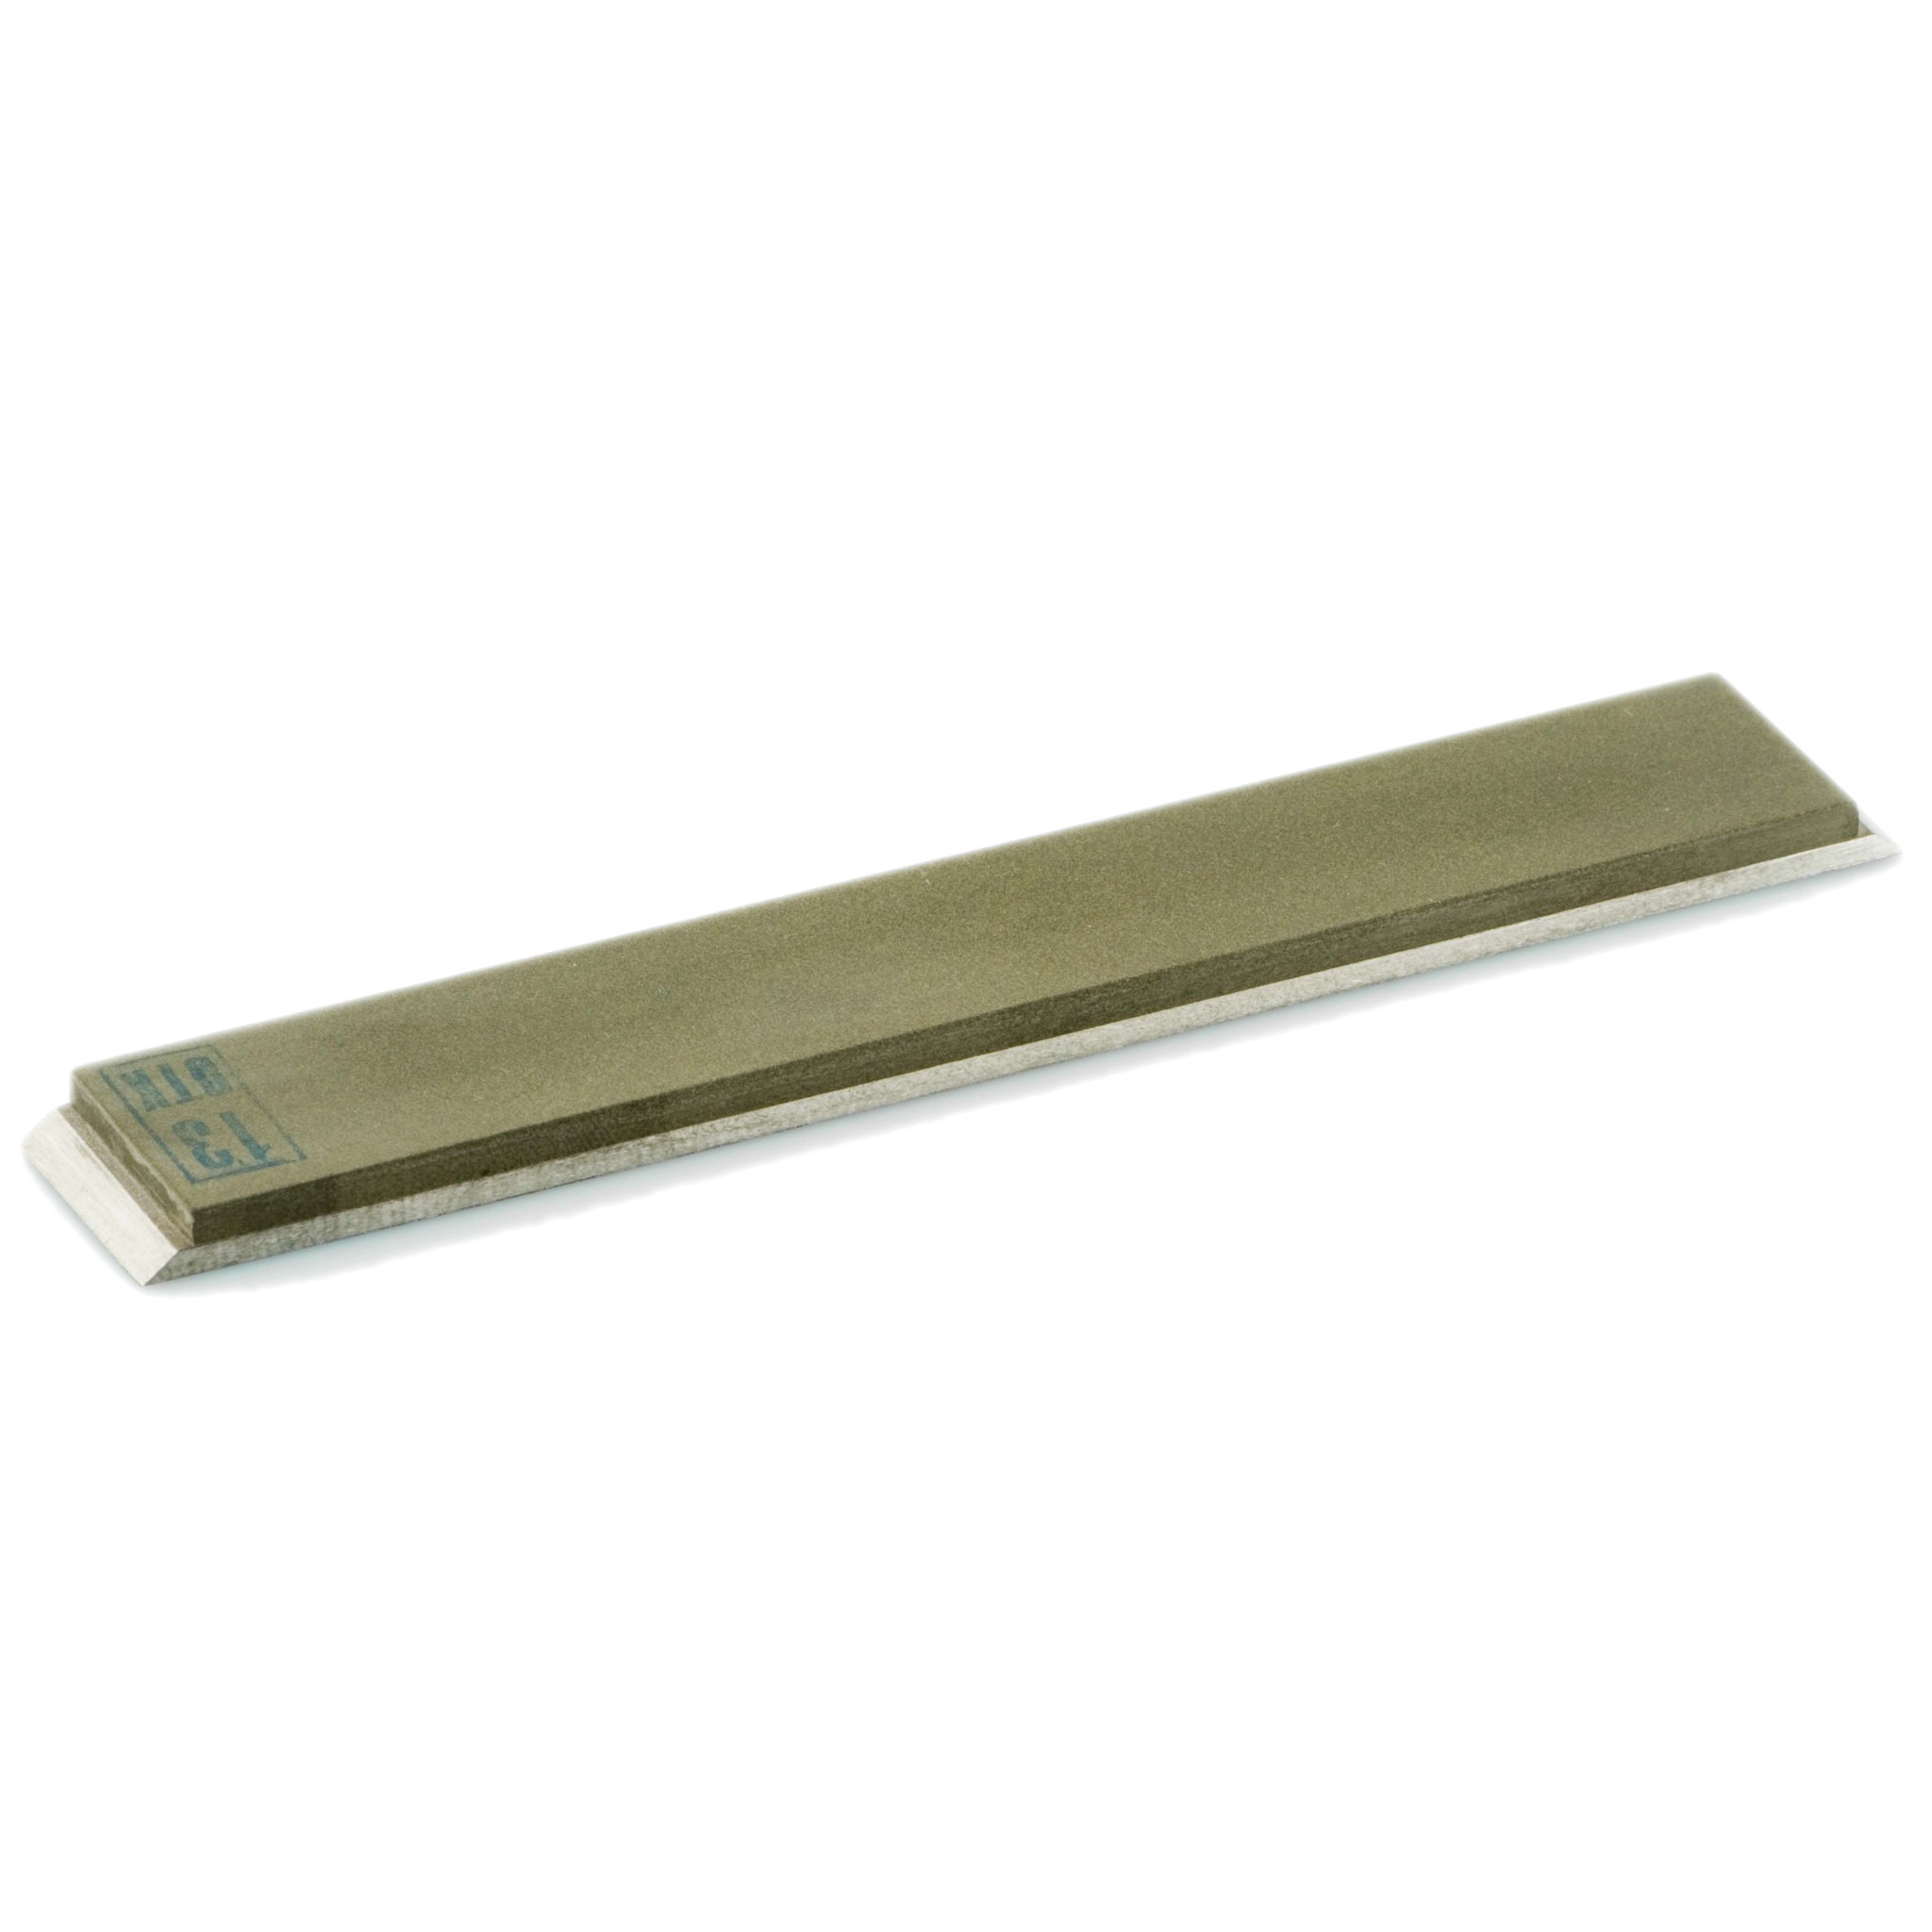 150х25х6 мм для Apex Edge Pro, ЖУК Алмазный брусок 150х25х6 50/40 25% Белый.jpg